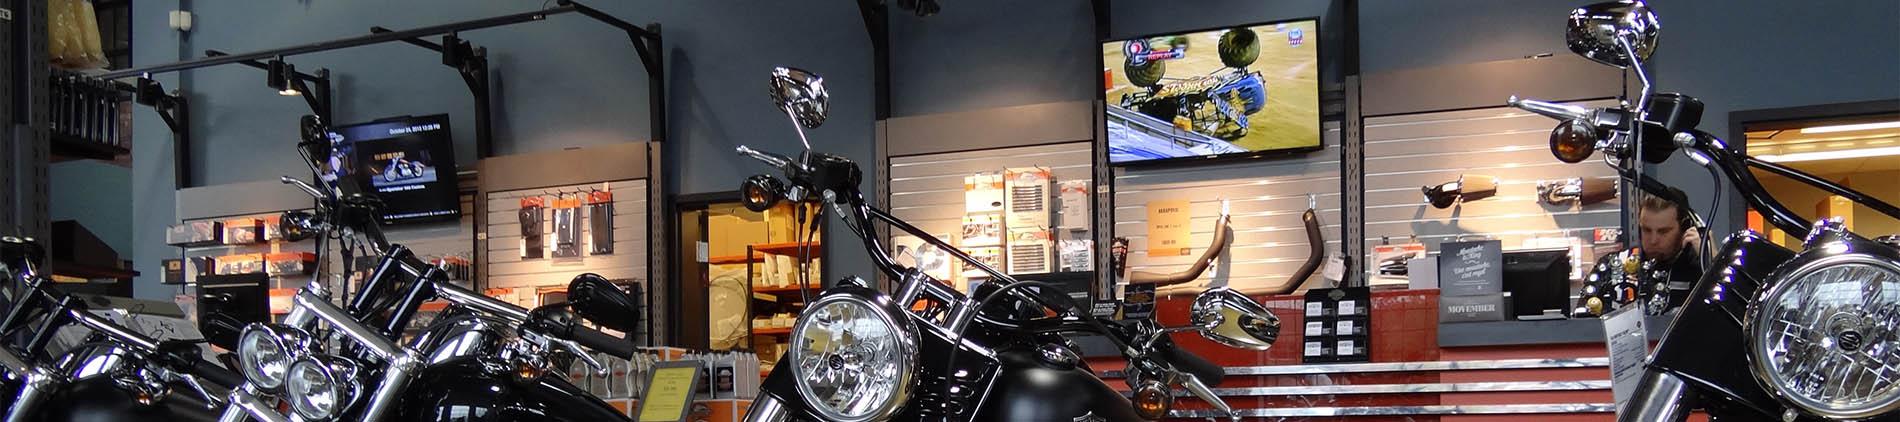 Commercial, Harley, Davidson, Display